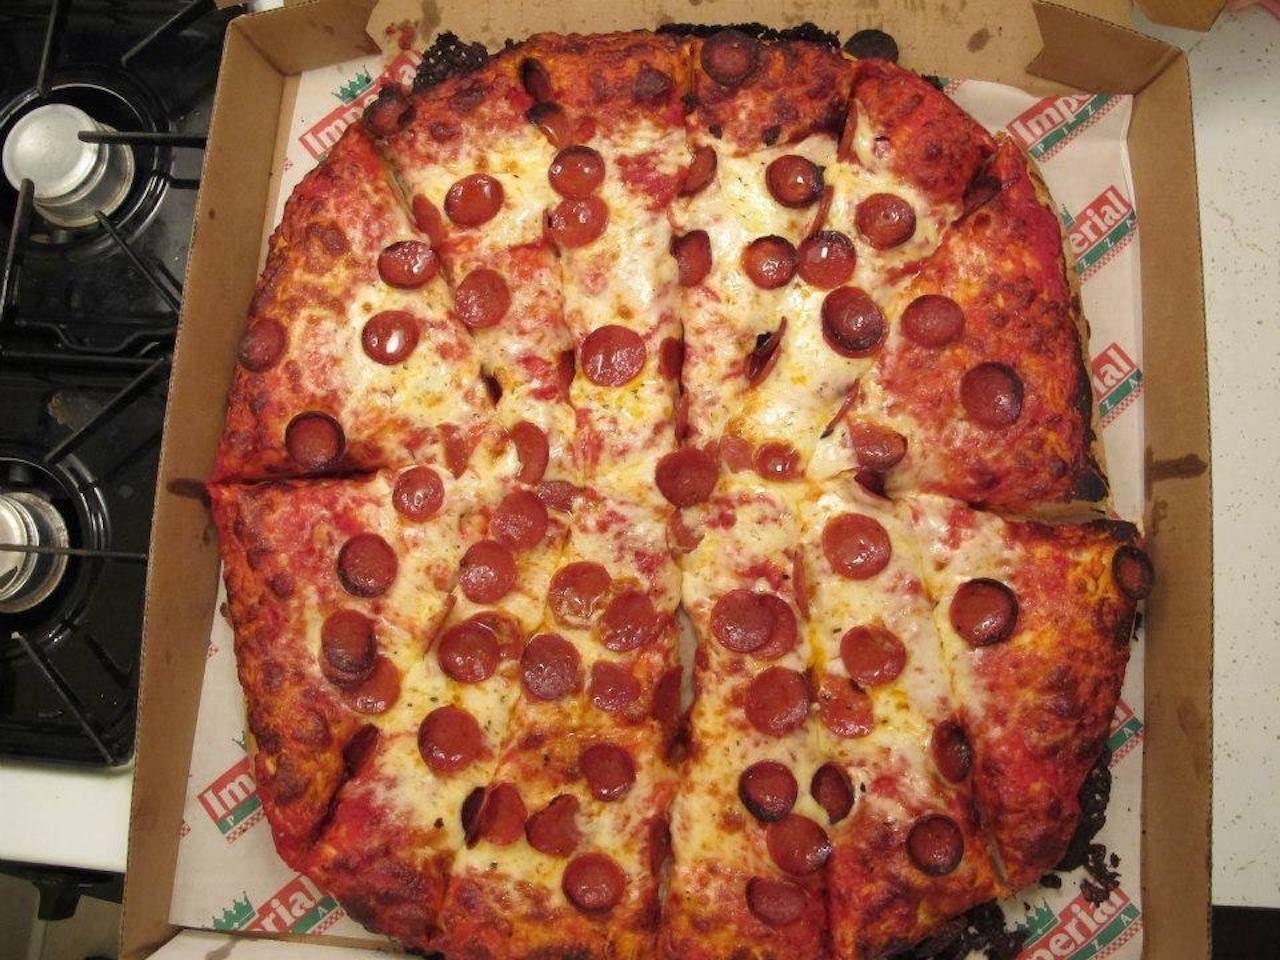 Imperial pizza from Forgotten Buffalo in western NY